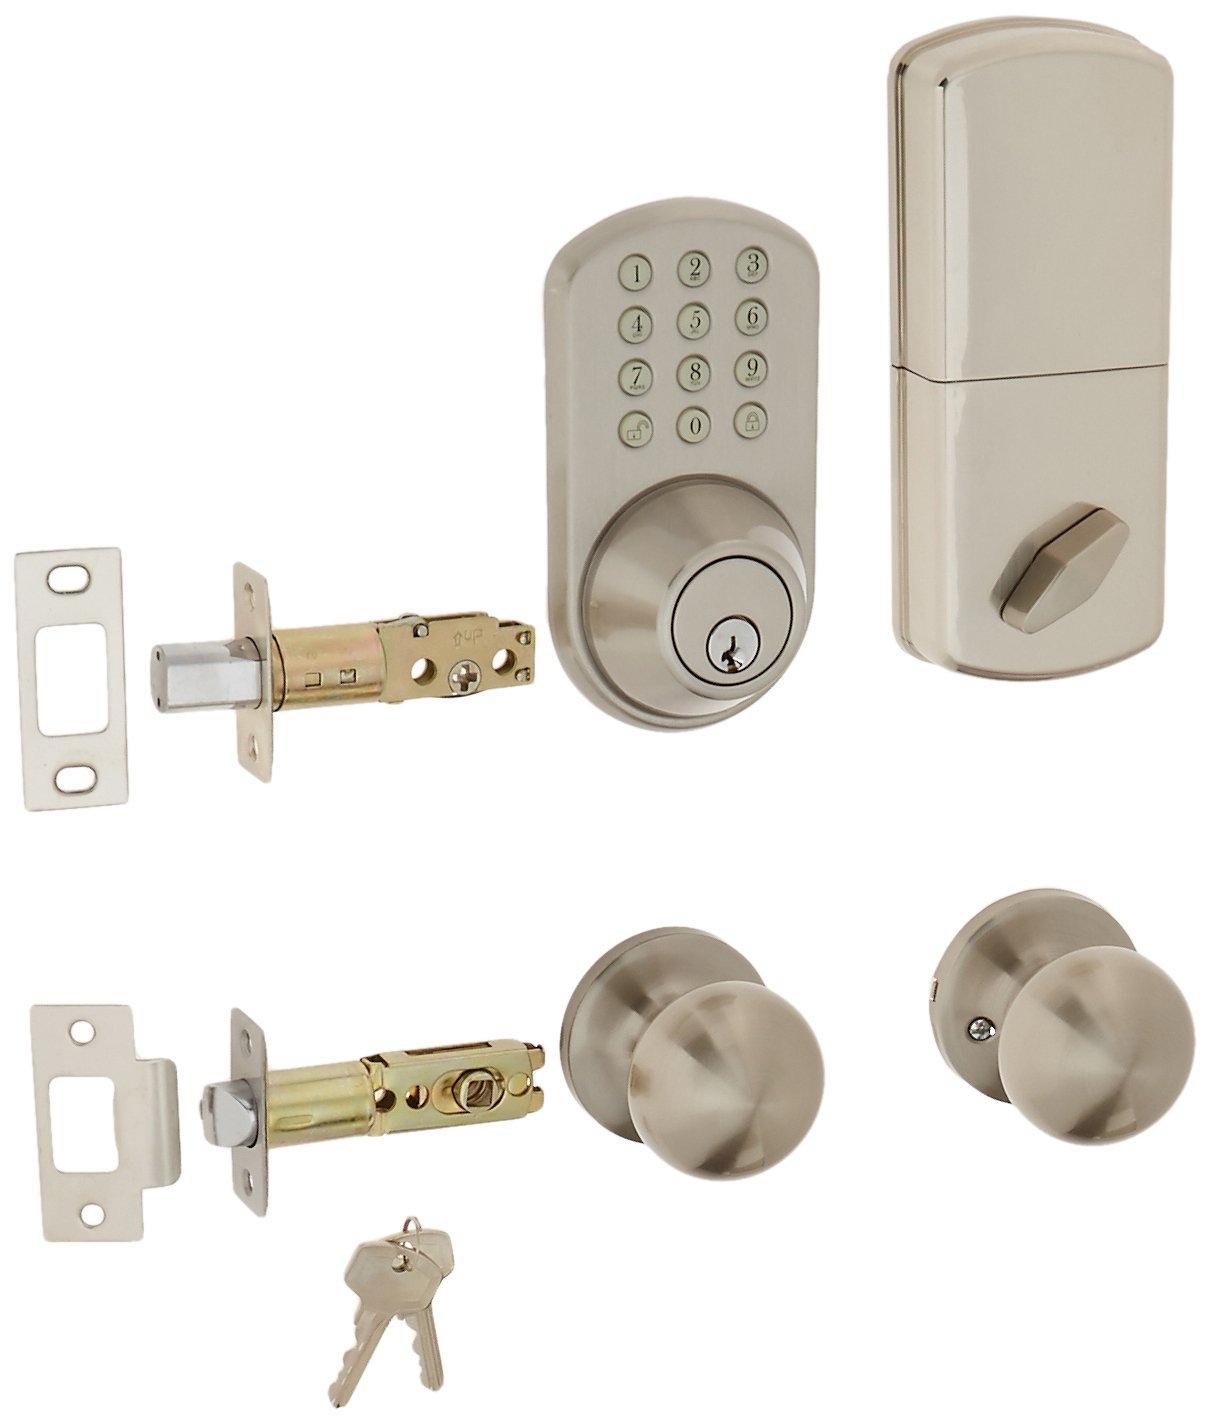 MiLocks TFK 02SN Digital Deadbolt Door Lock And Passage Knob Combo With  Keyless Entry Via Keypad Code For Exterior Doors, Satin Nickel      Amazon.com